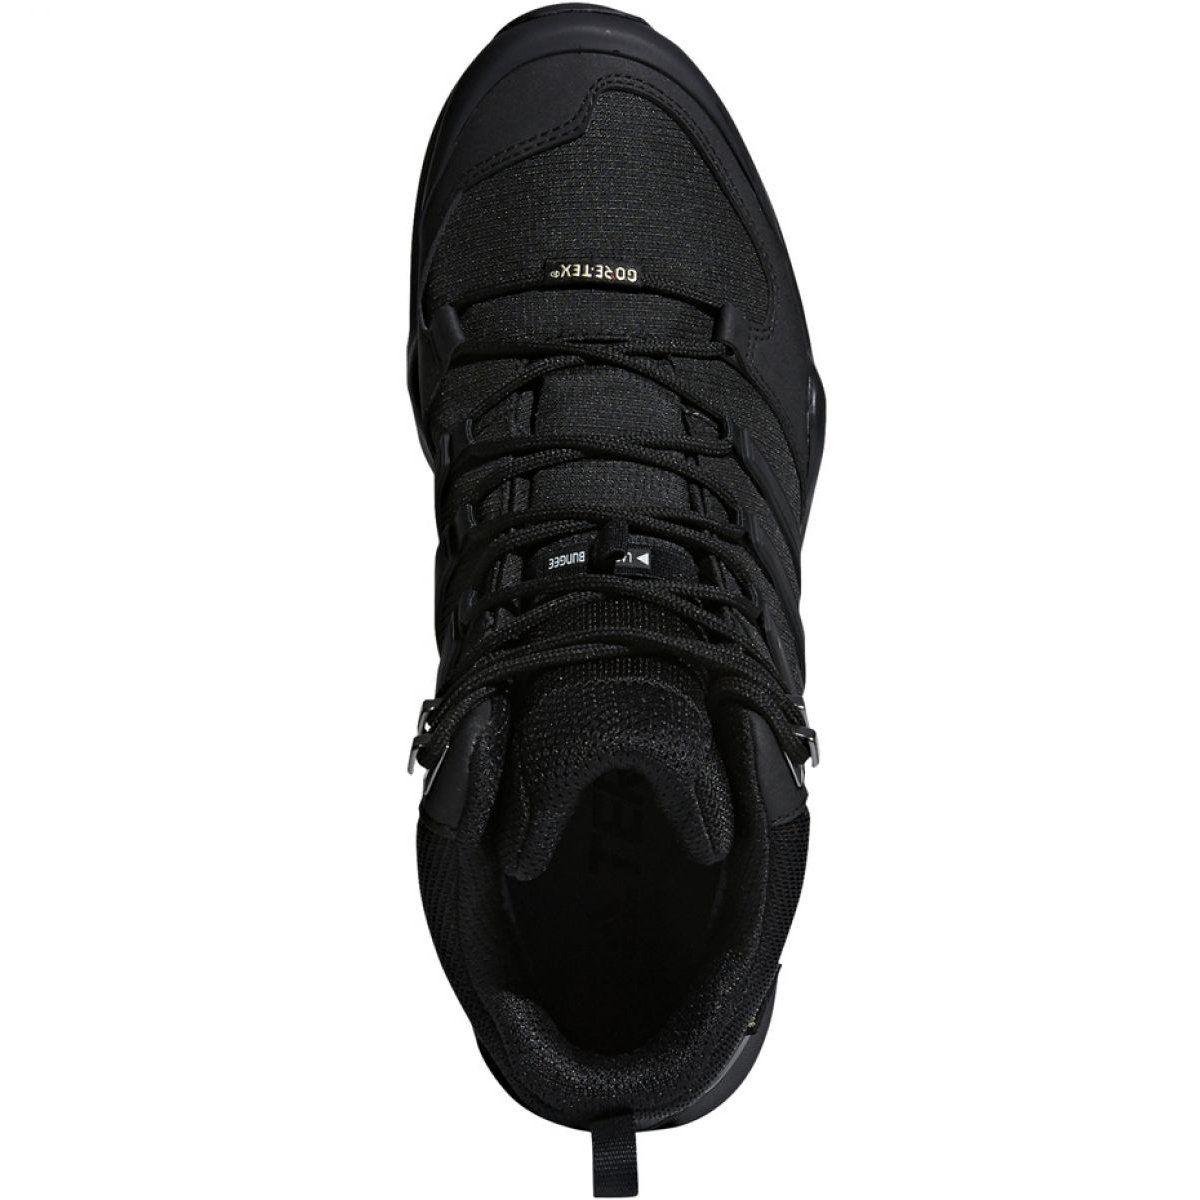 Buty Adidas Terrex Swift R2 Mid Gtx M Cm7500 Czarne Sports Shoes Adidas Shoes Sneakers Adidas Trekking Shoes